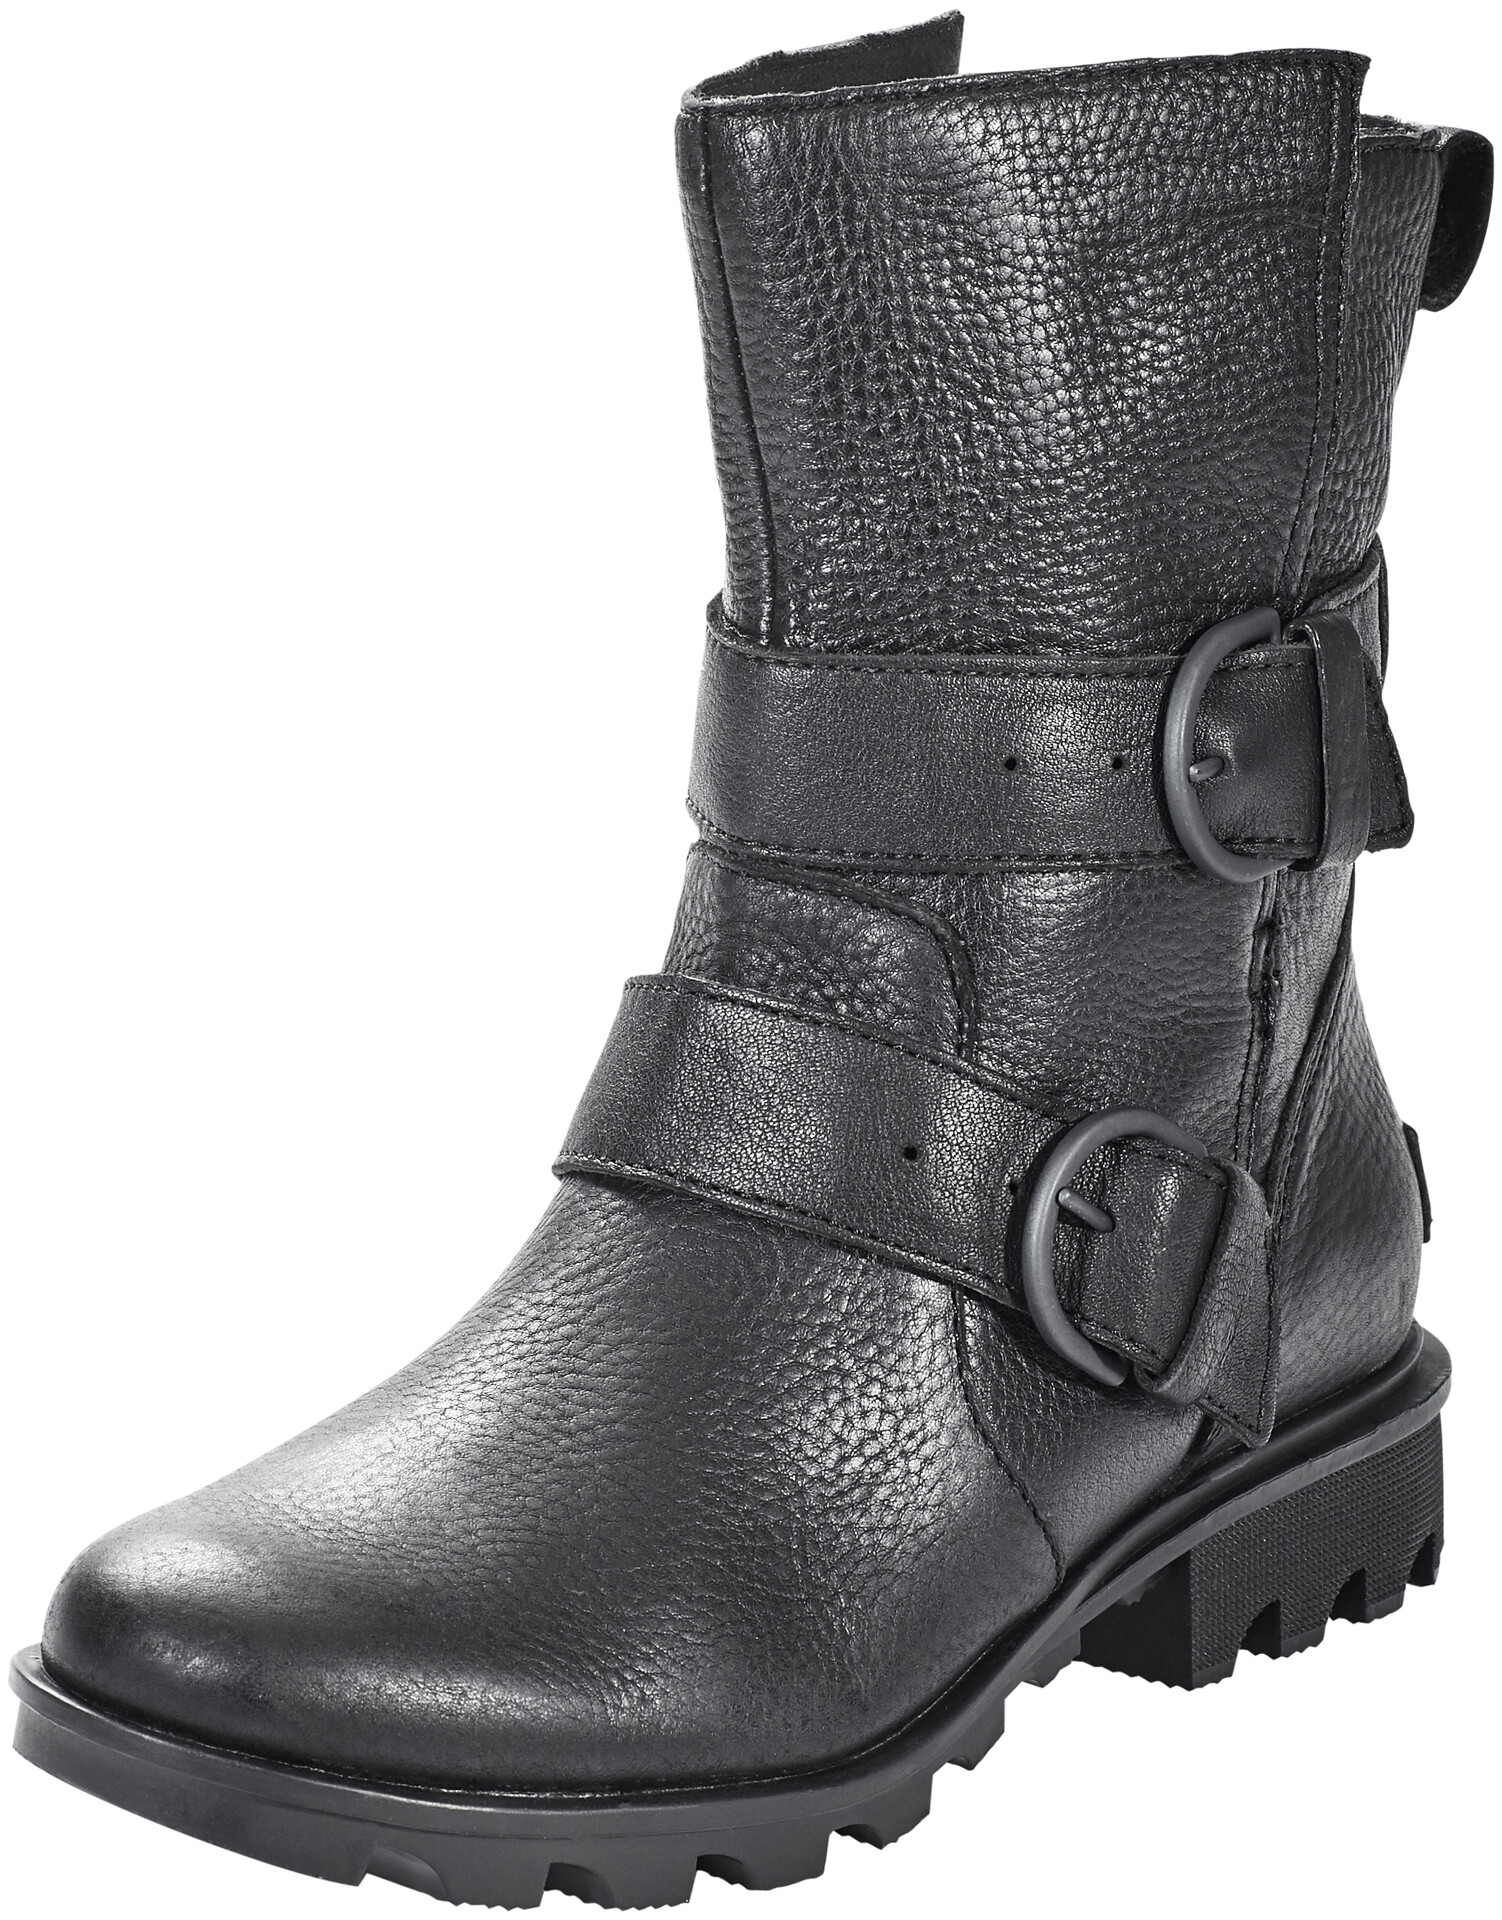 Sorel Phoenix Moto Boots Women black at